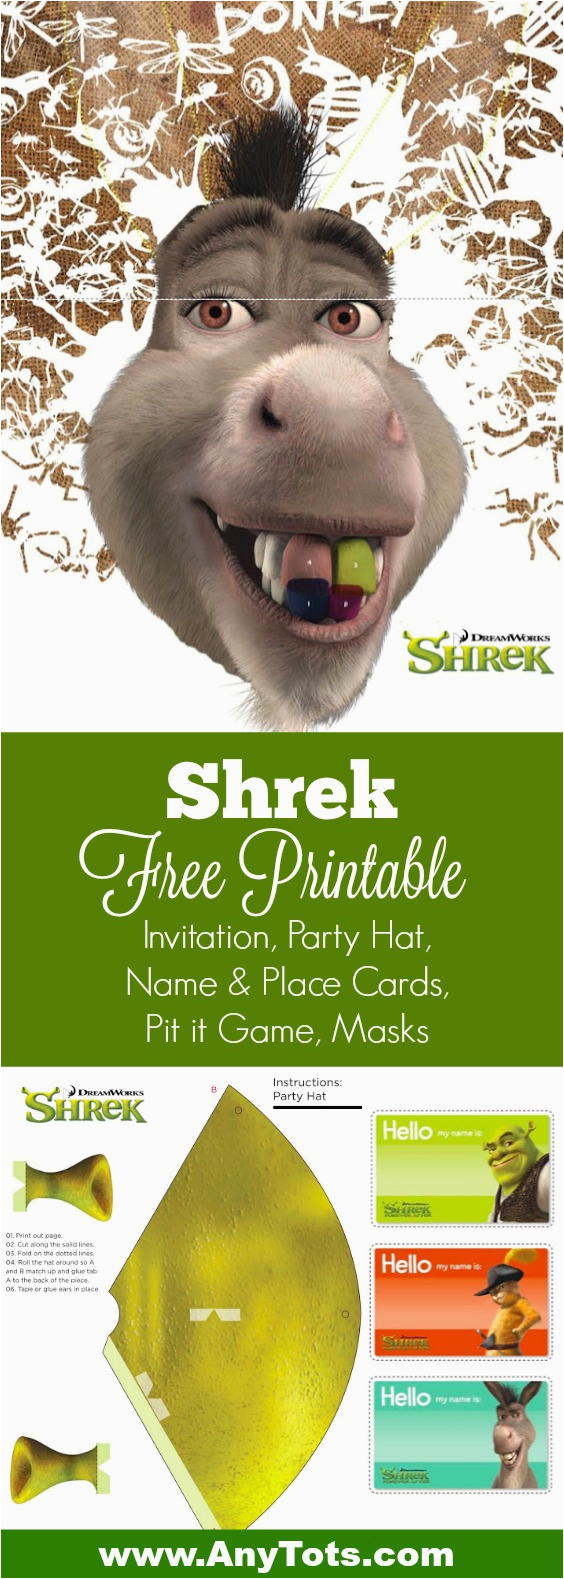 free printable shrek birthday party invitation